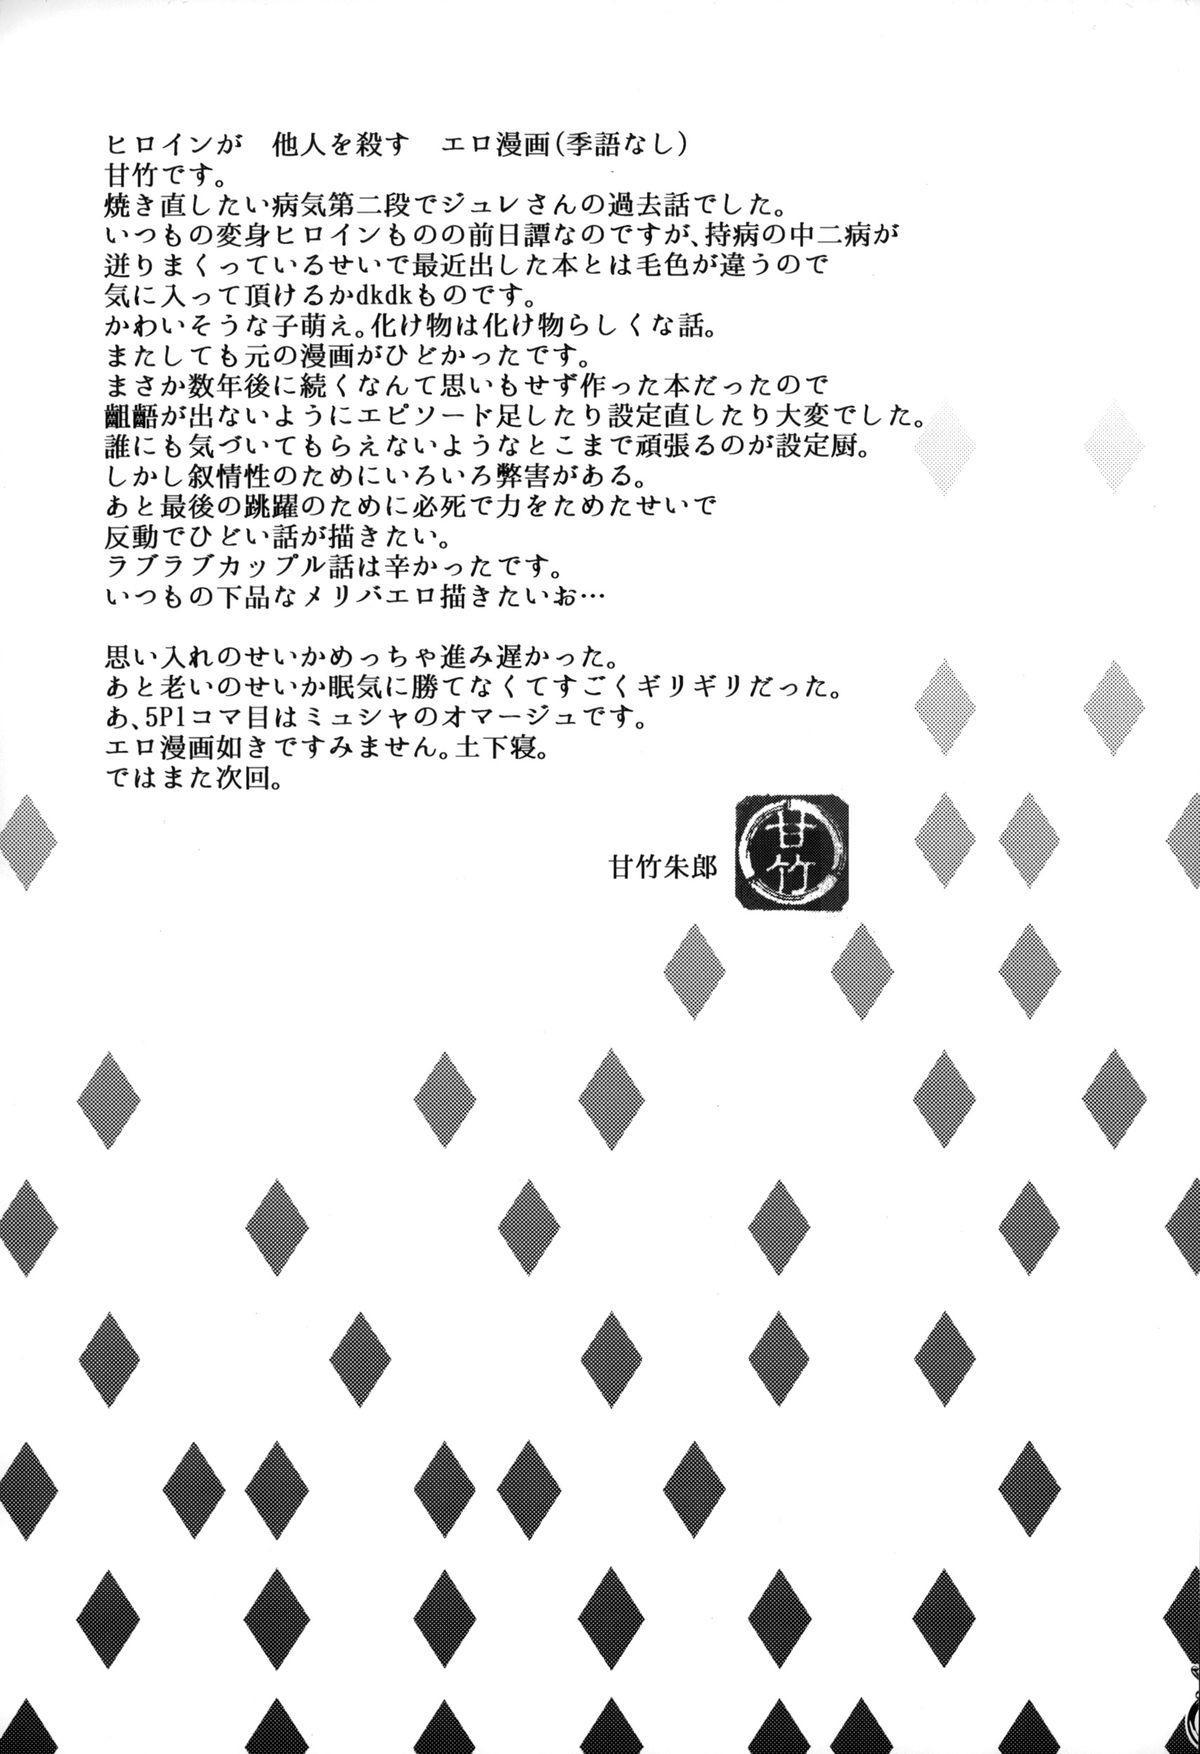 Kakka no Chouki-sama | The Mistress of His Excellency 31